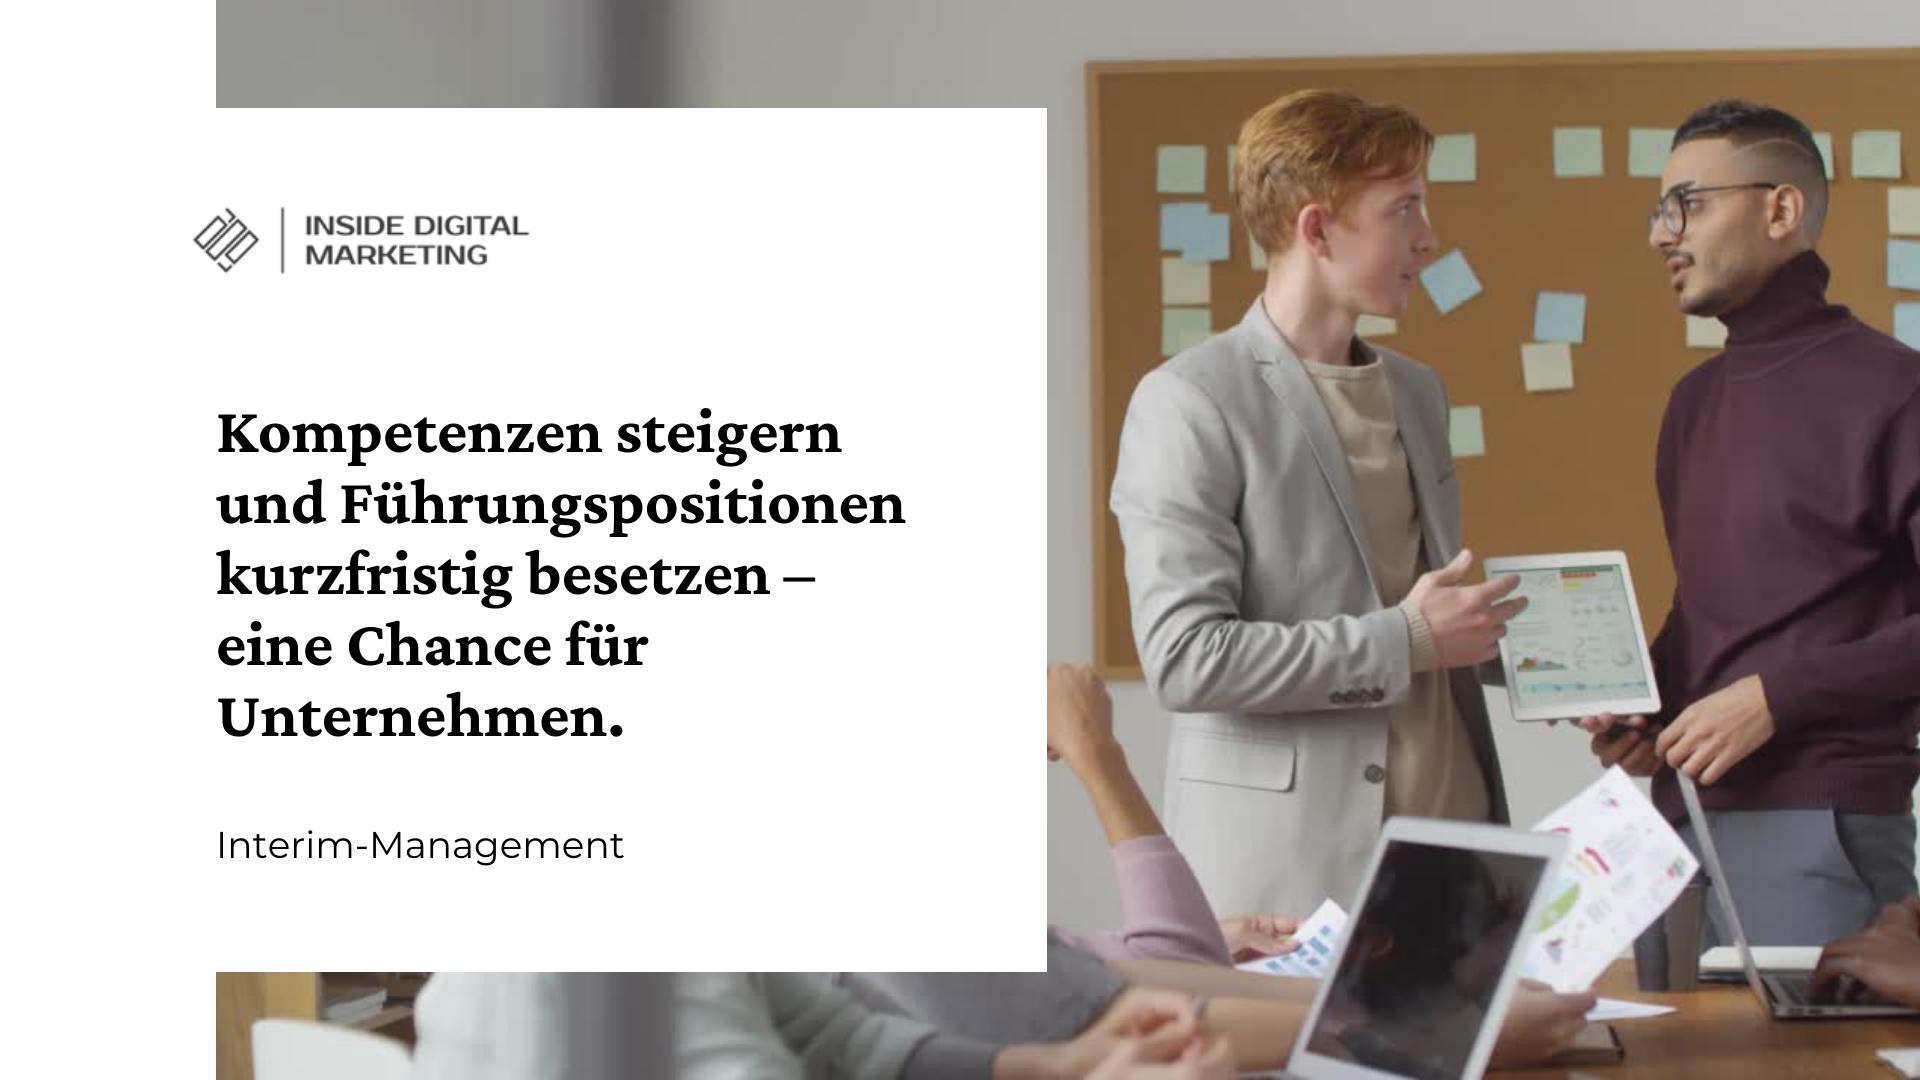 Interim-Management digitales Marketing - Online-Marketing